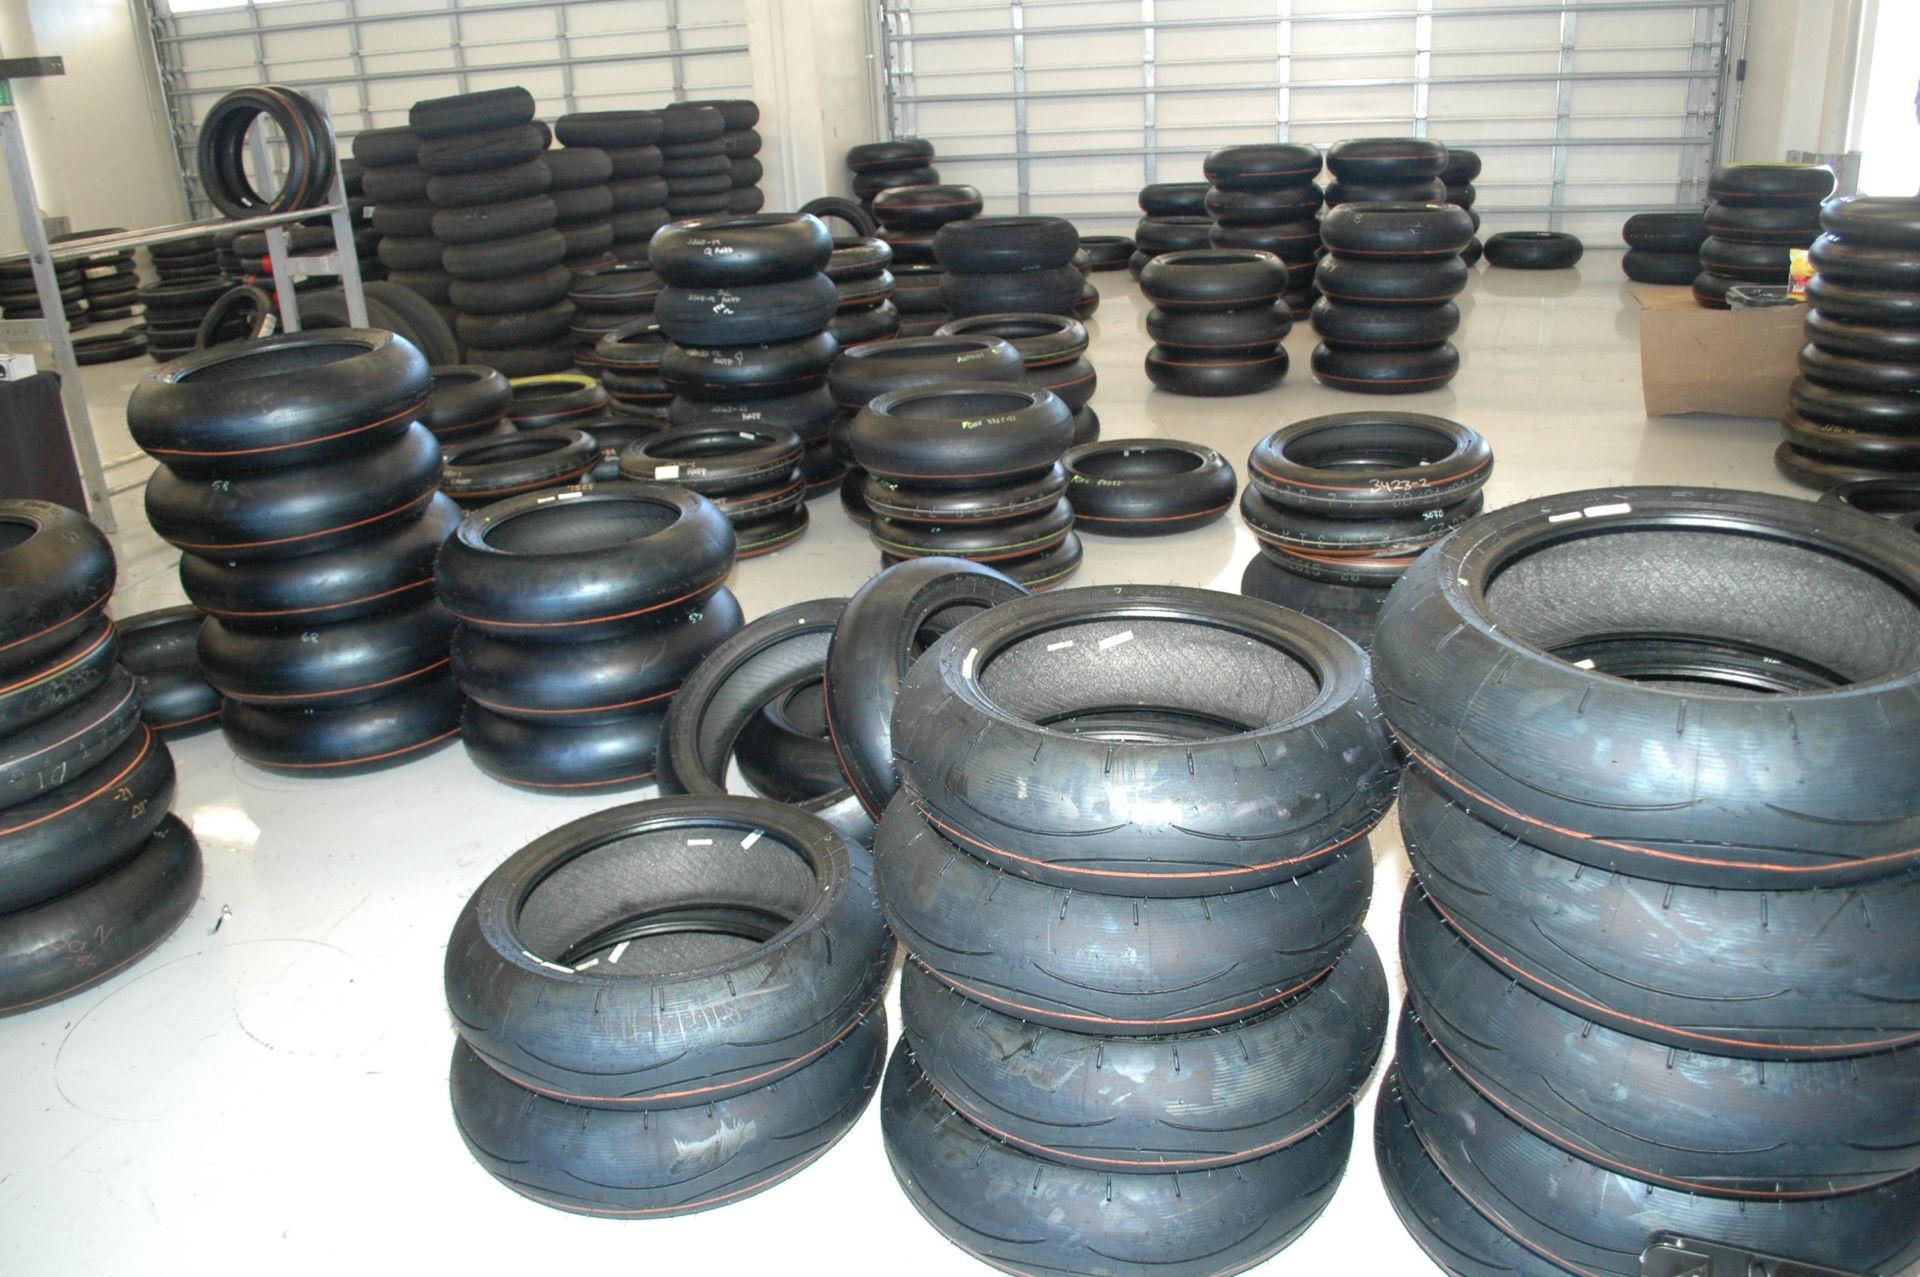 Dunlop motorcycle road racing tires. Photo by David Swarts.